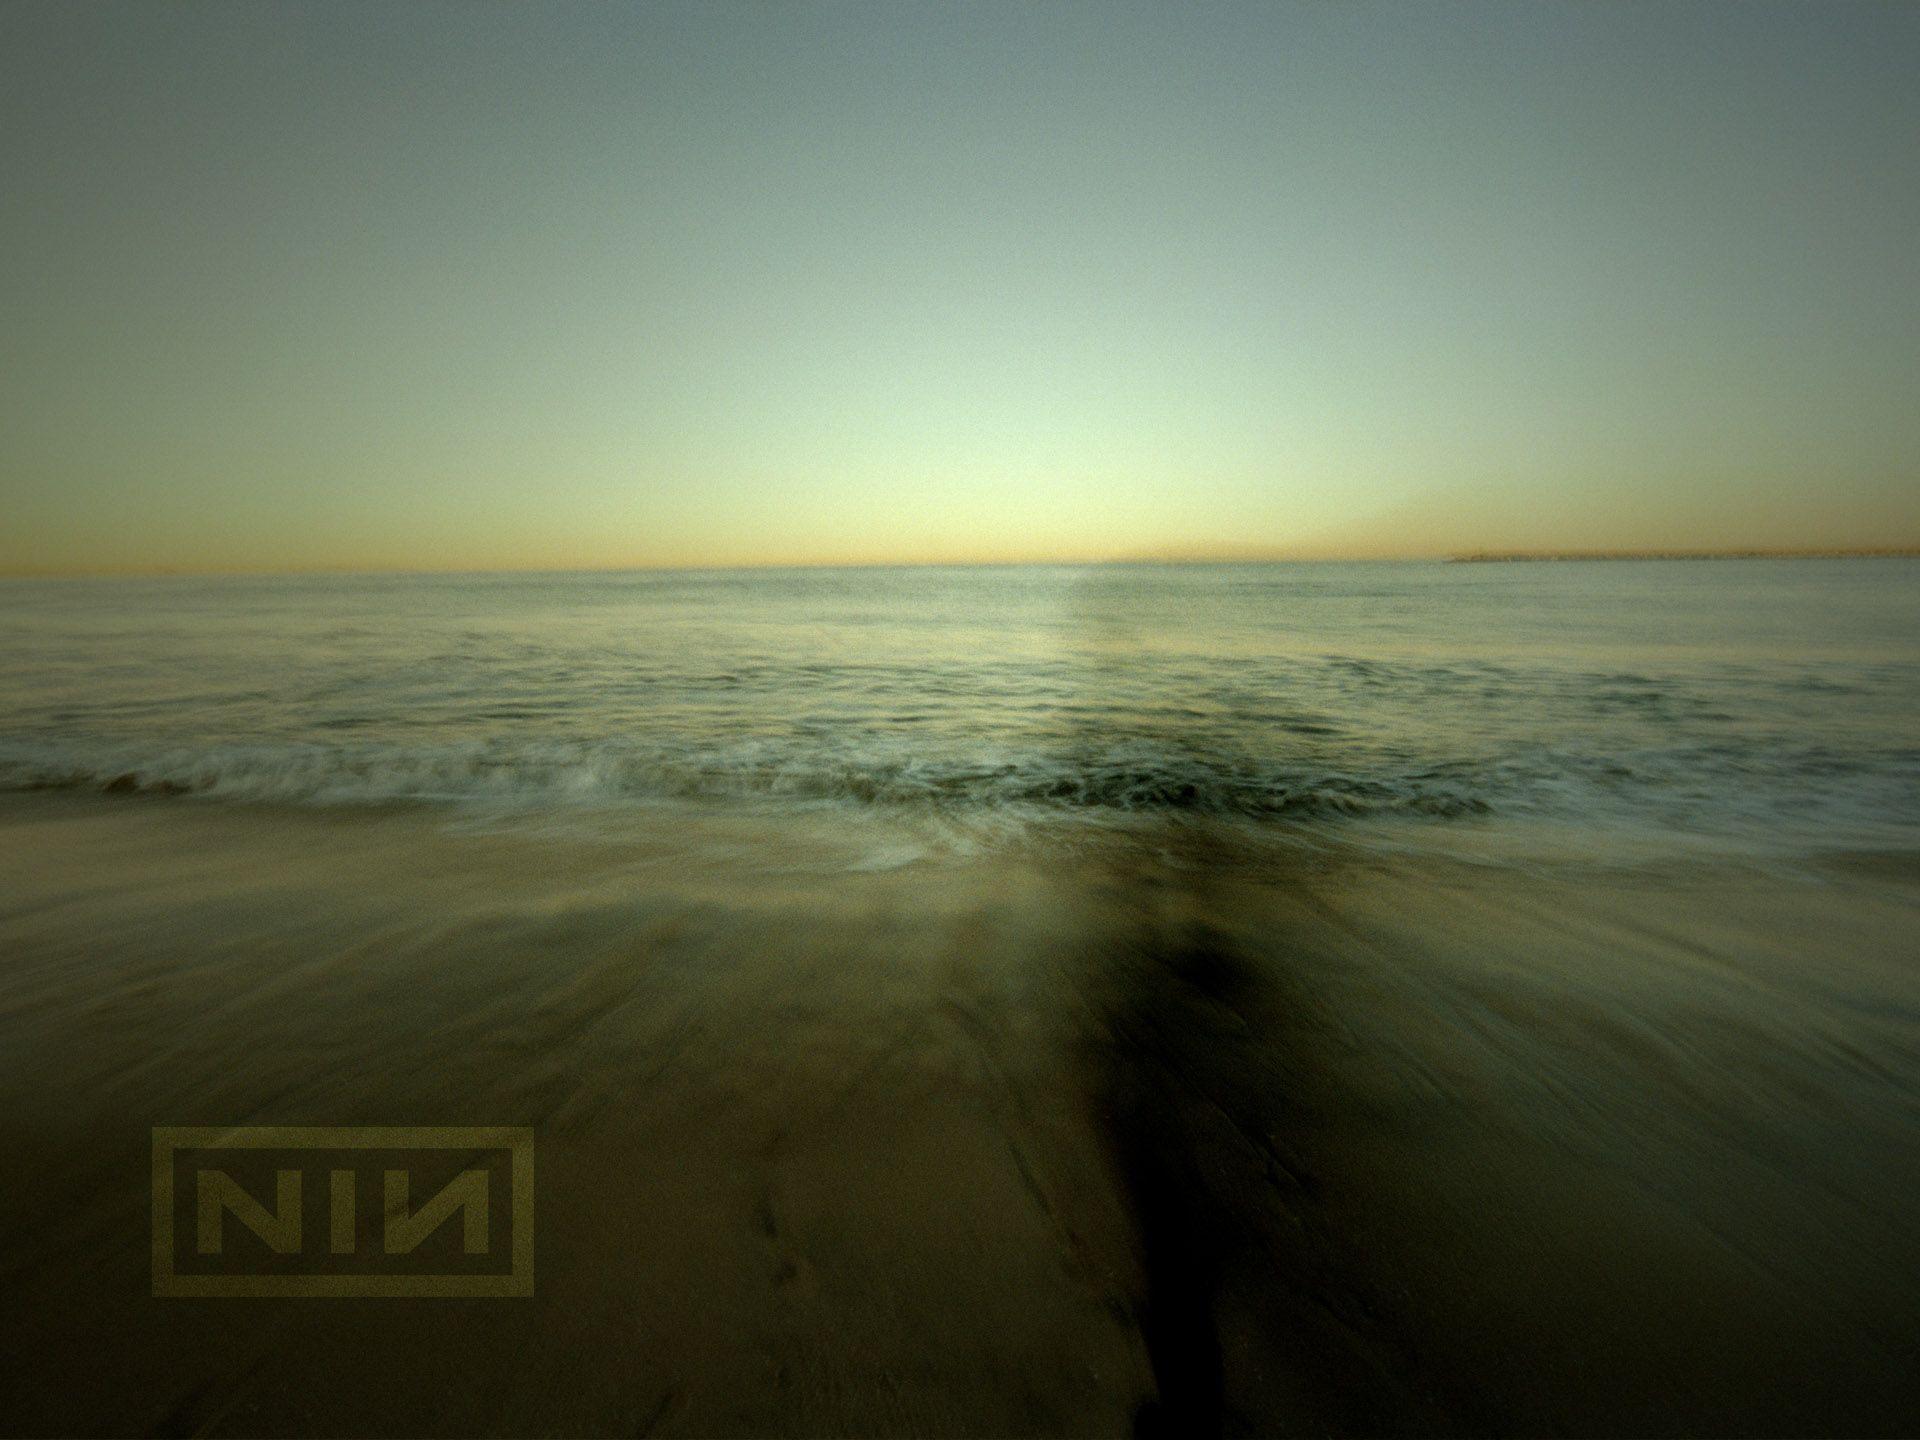 Extra Wallpaper3 Nine Inch Nails Rob Sheridan en